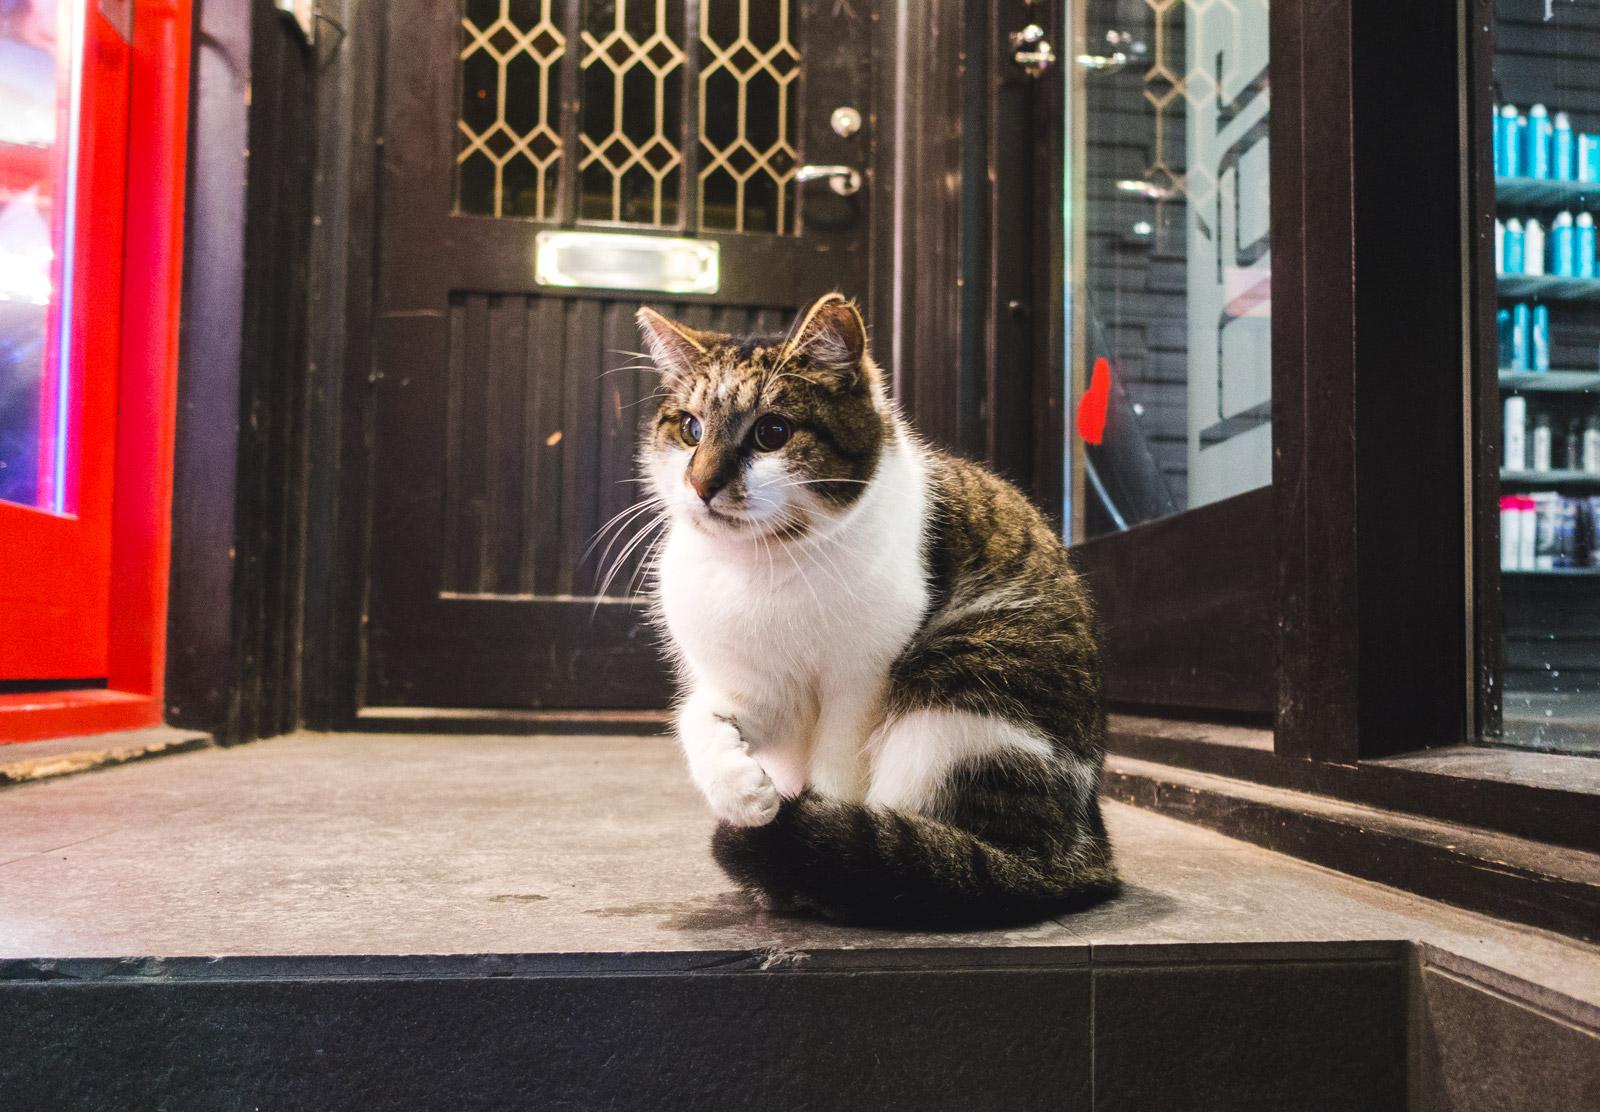 Cat on doorstep